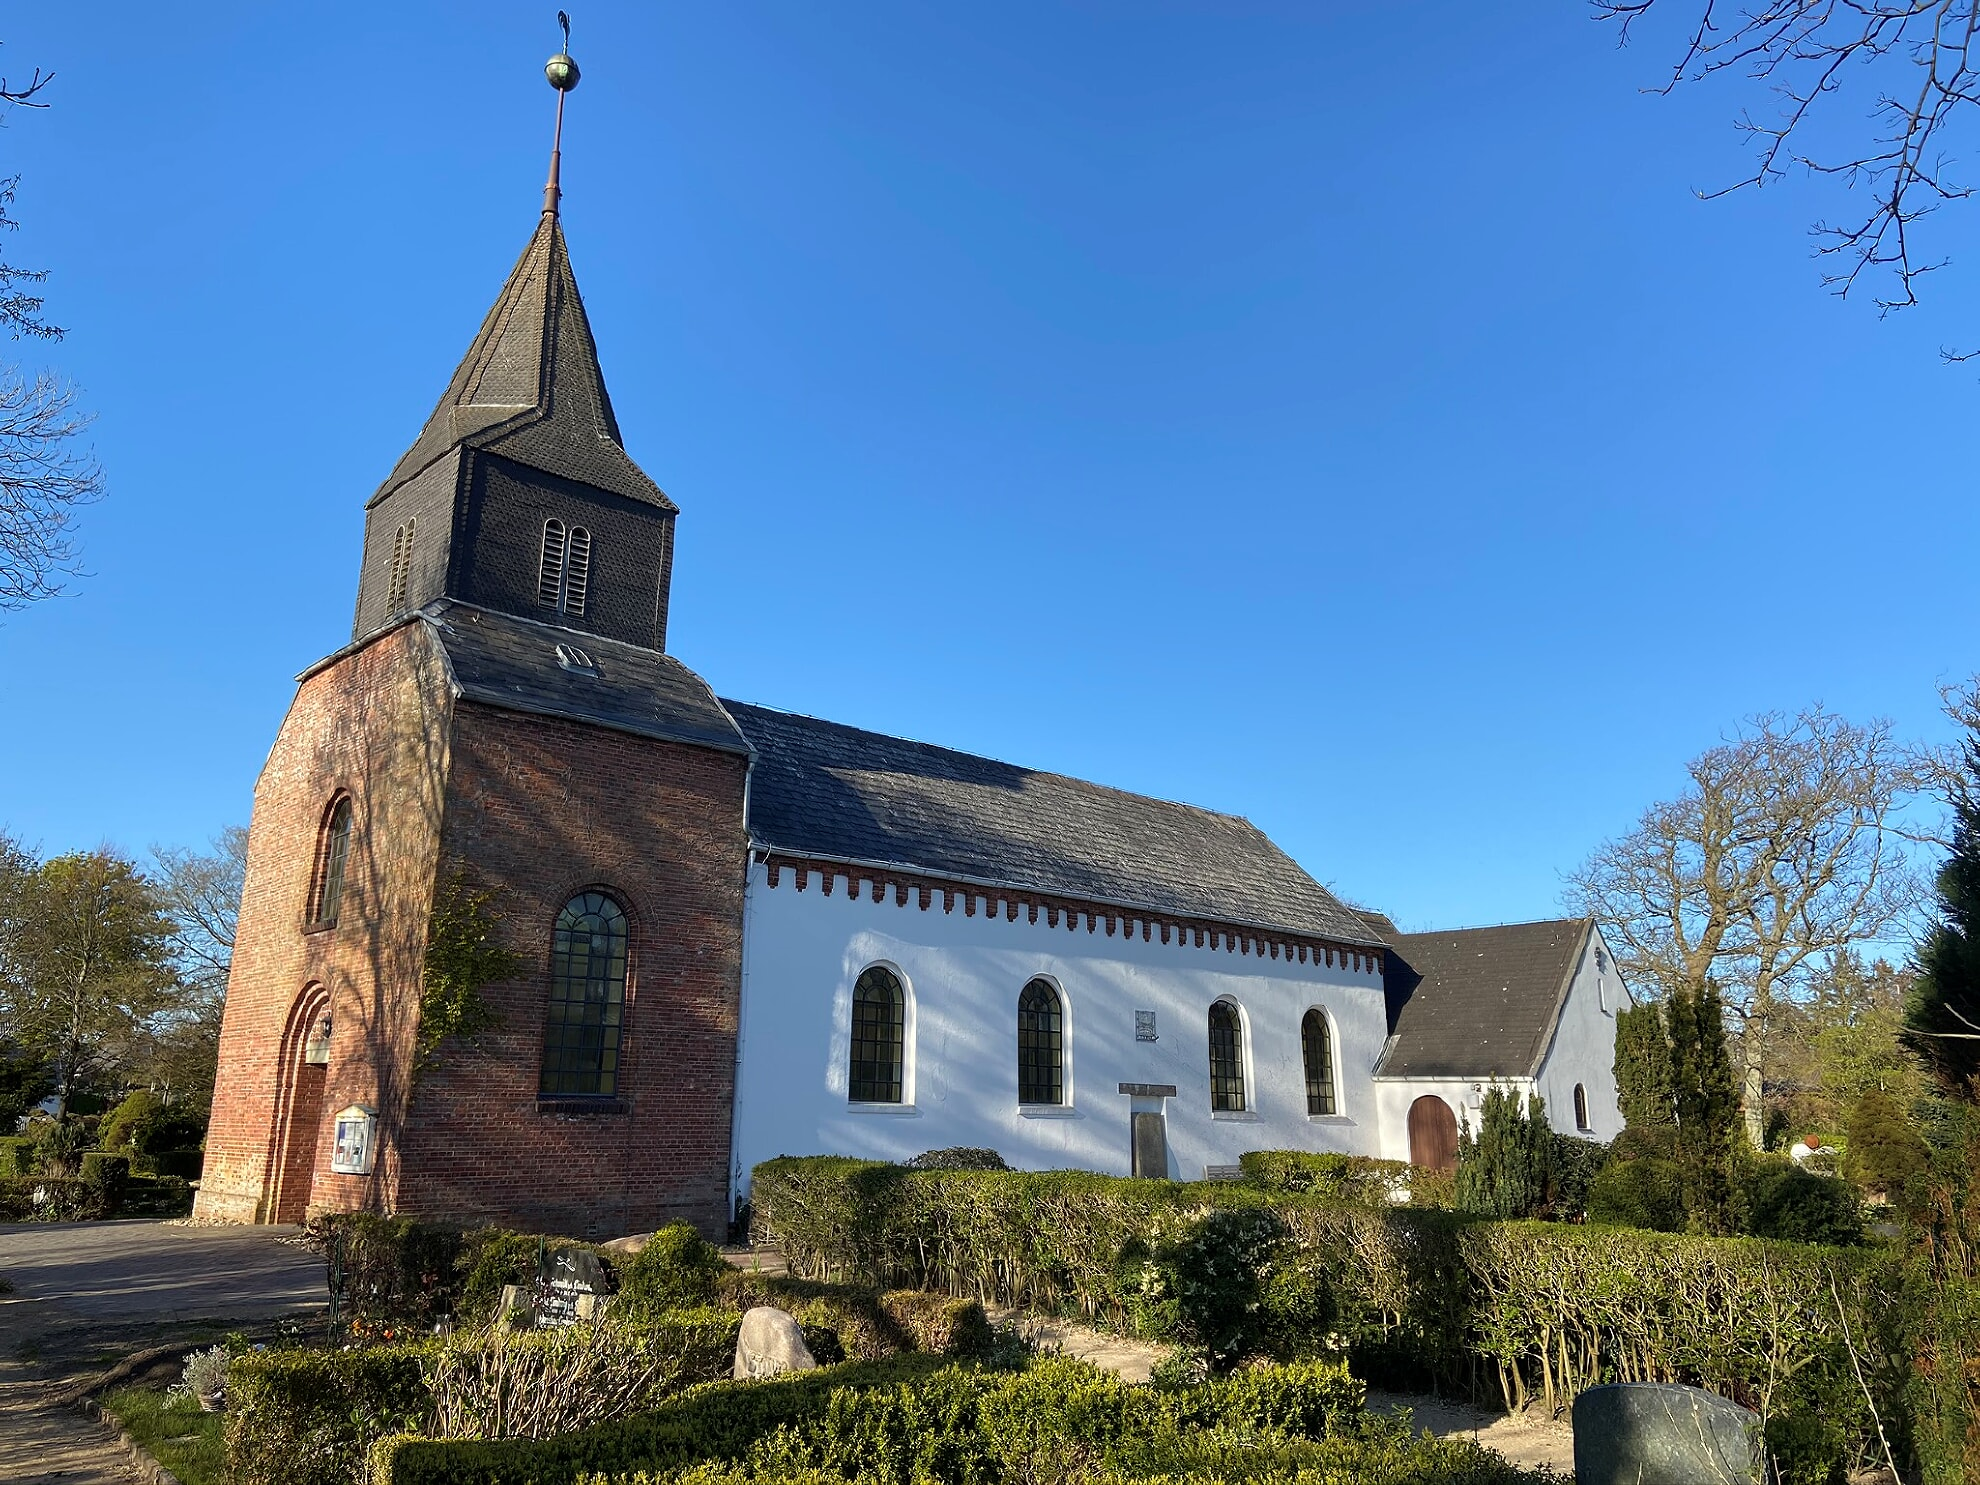 St. NIels in Westerland